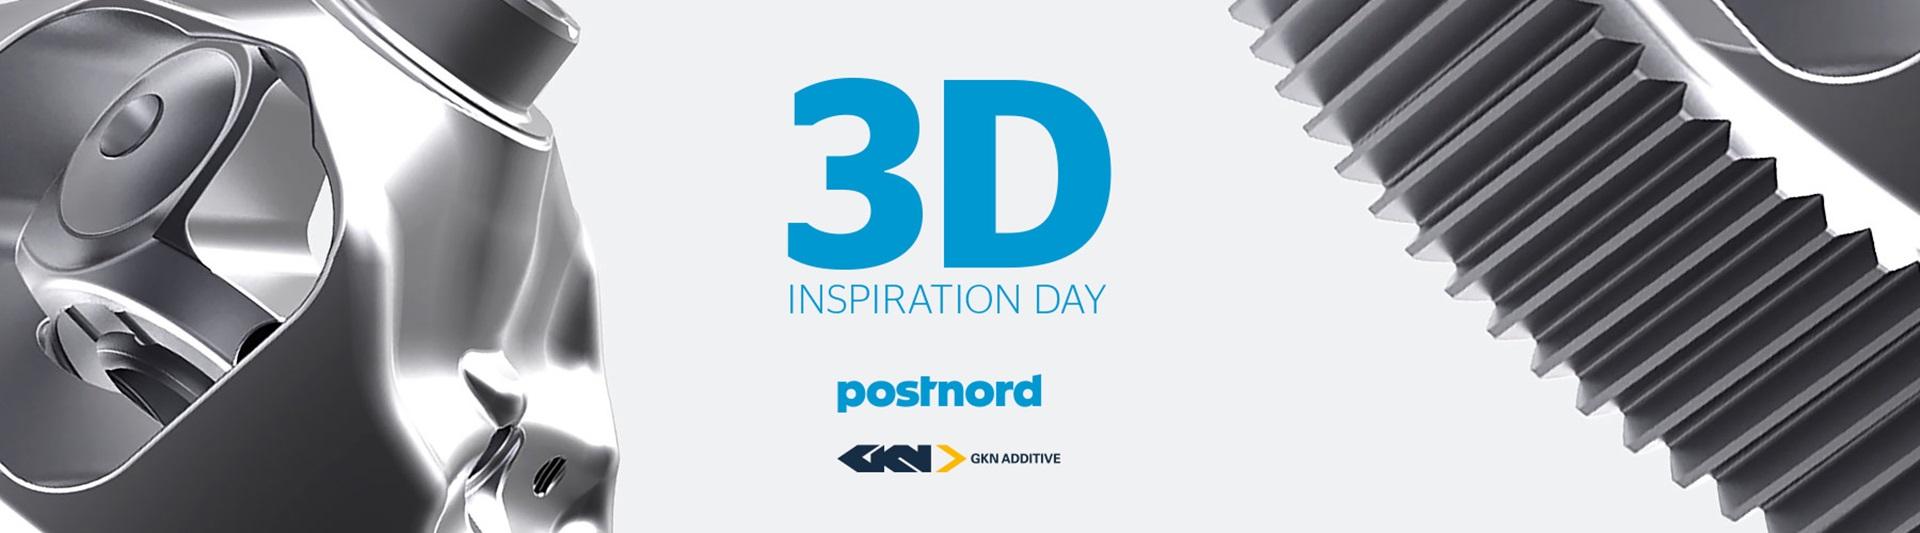 3D-inpiration_Hero-banner_3-1_2.jpg